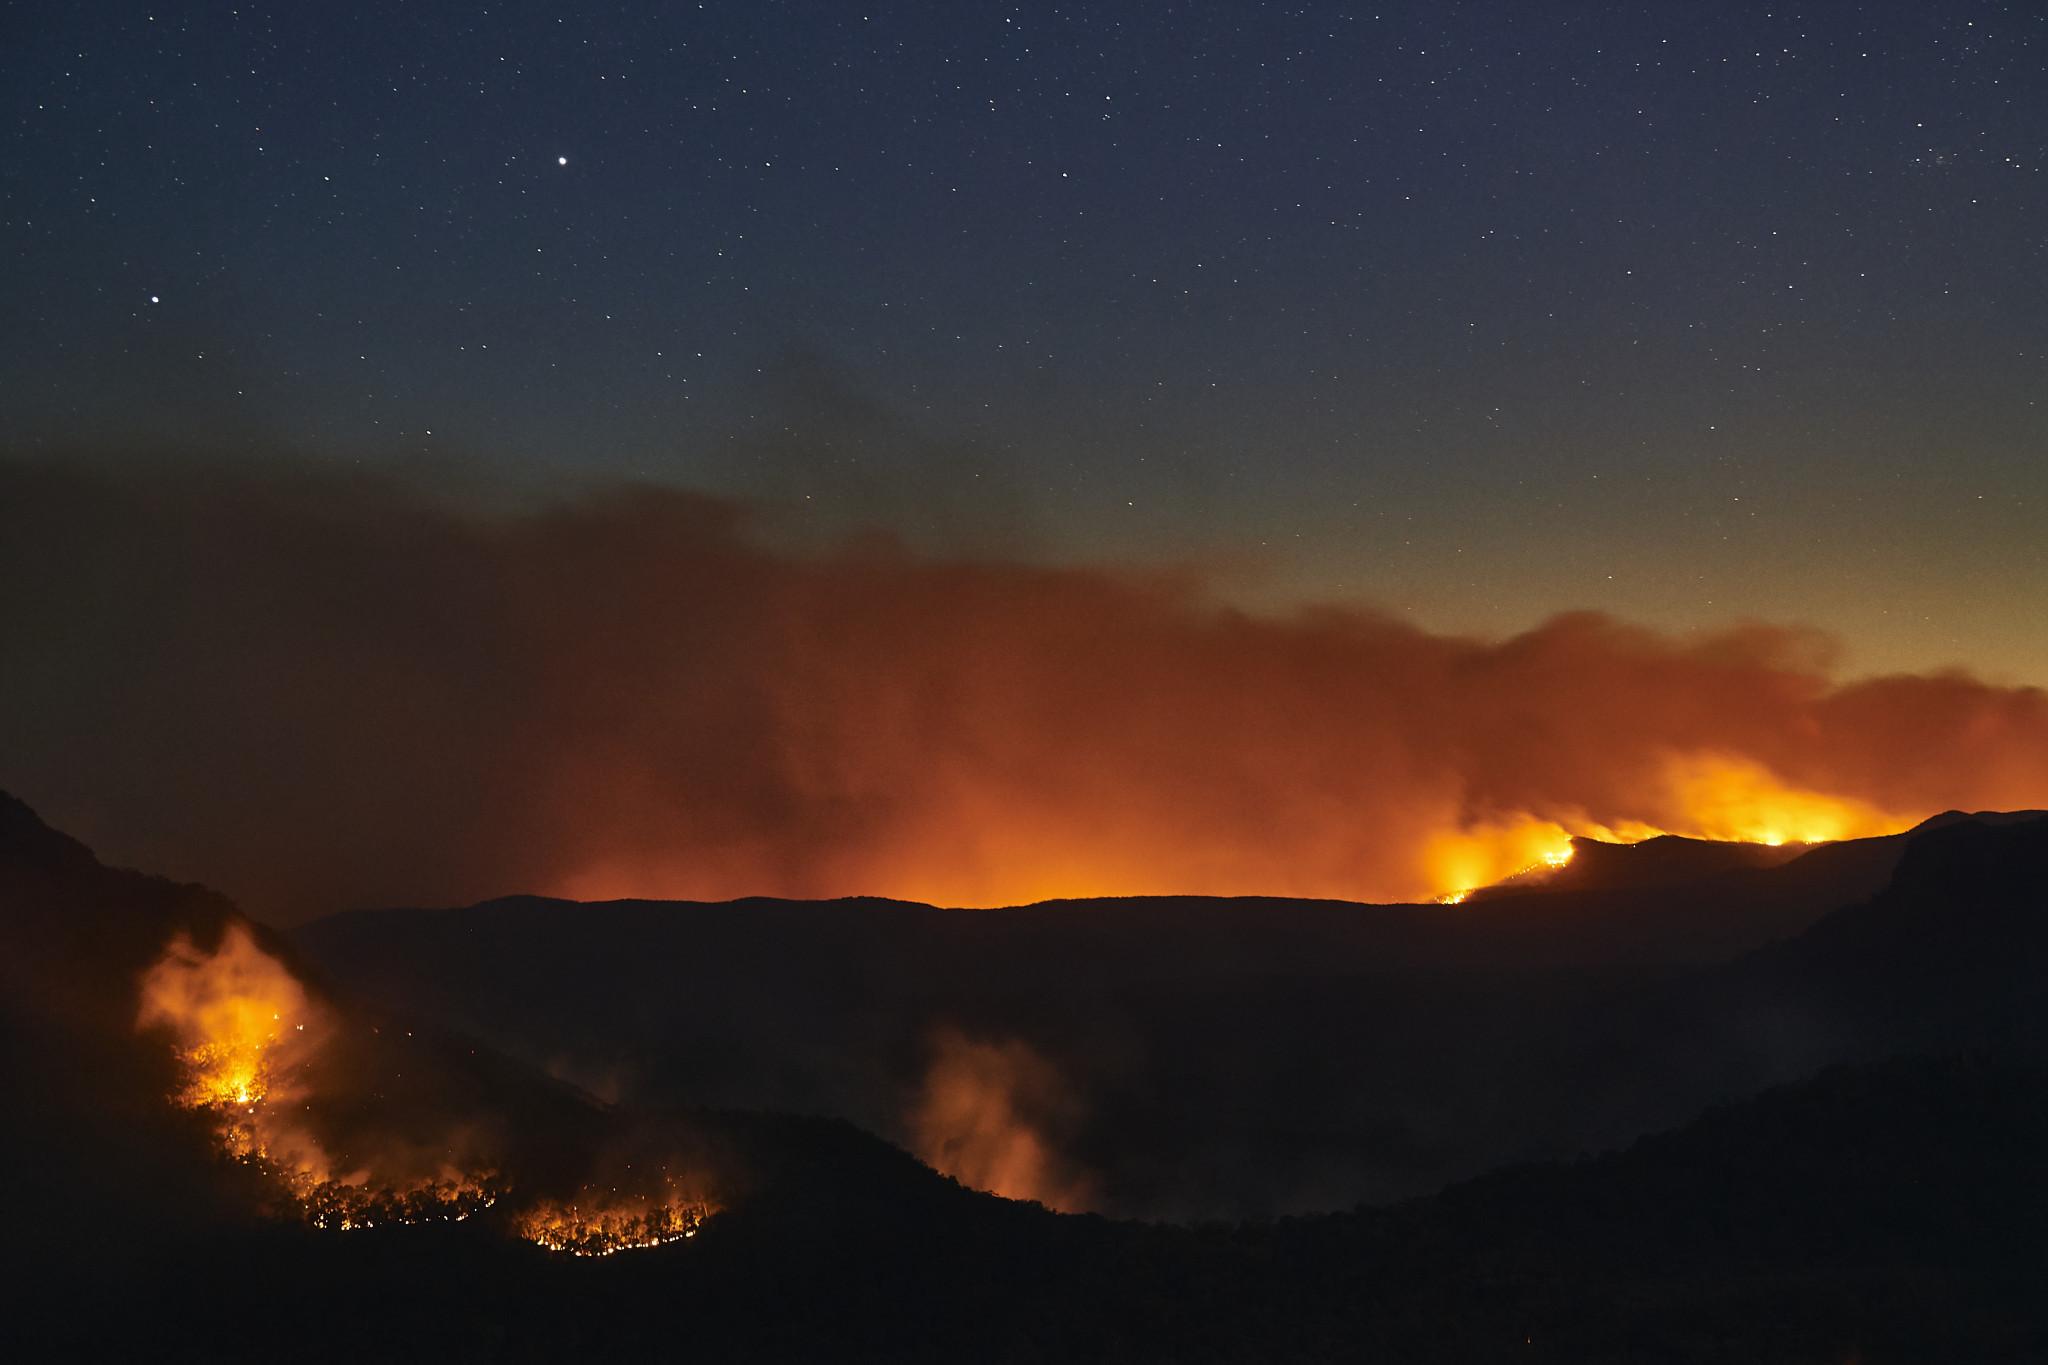 ITF President Haggerty praises bushfire fundraising surrounding Australian Open